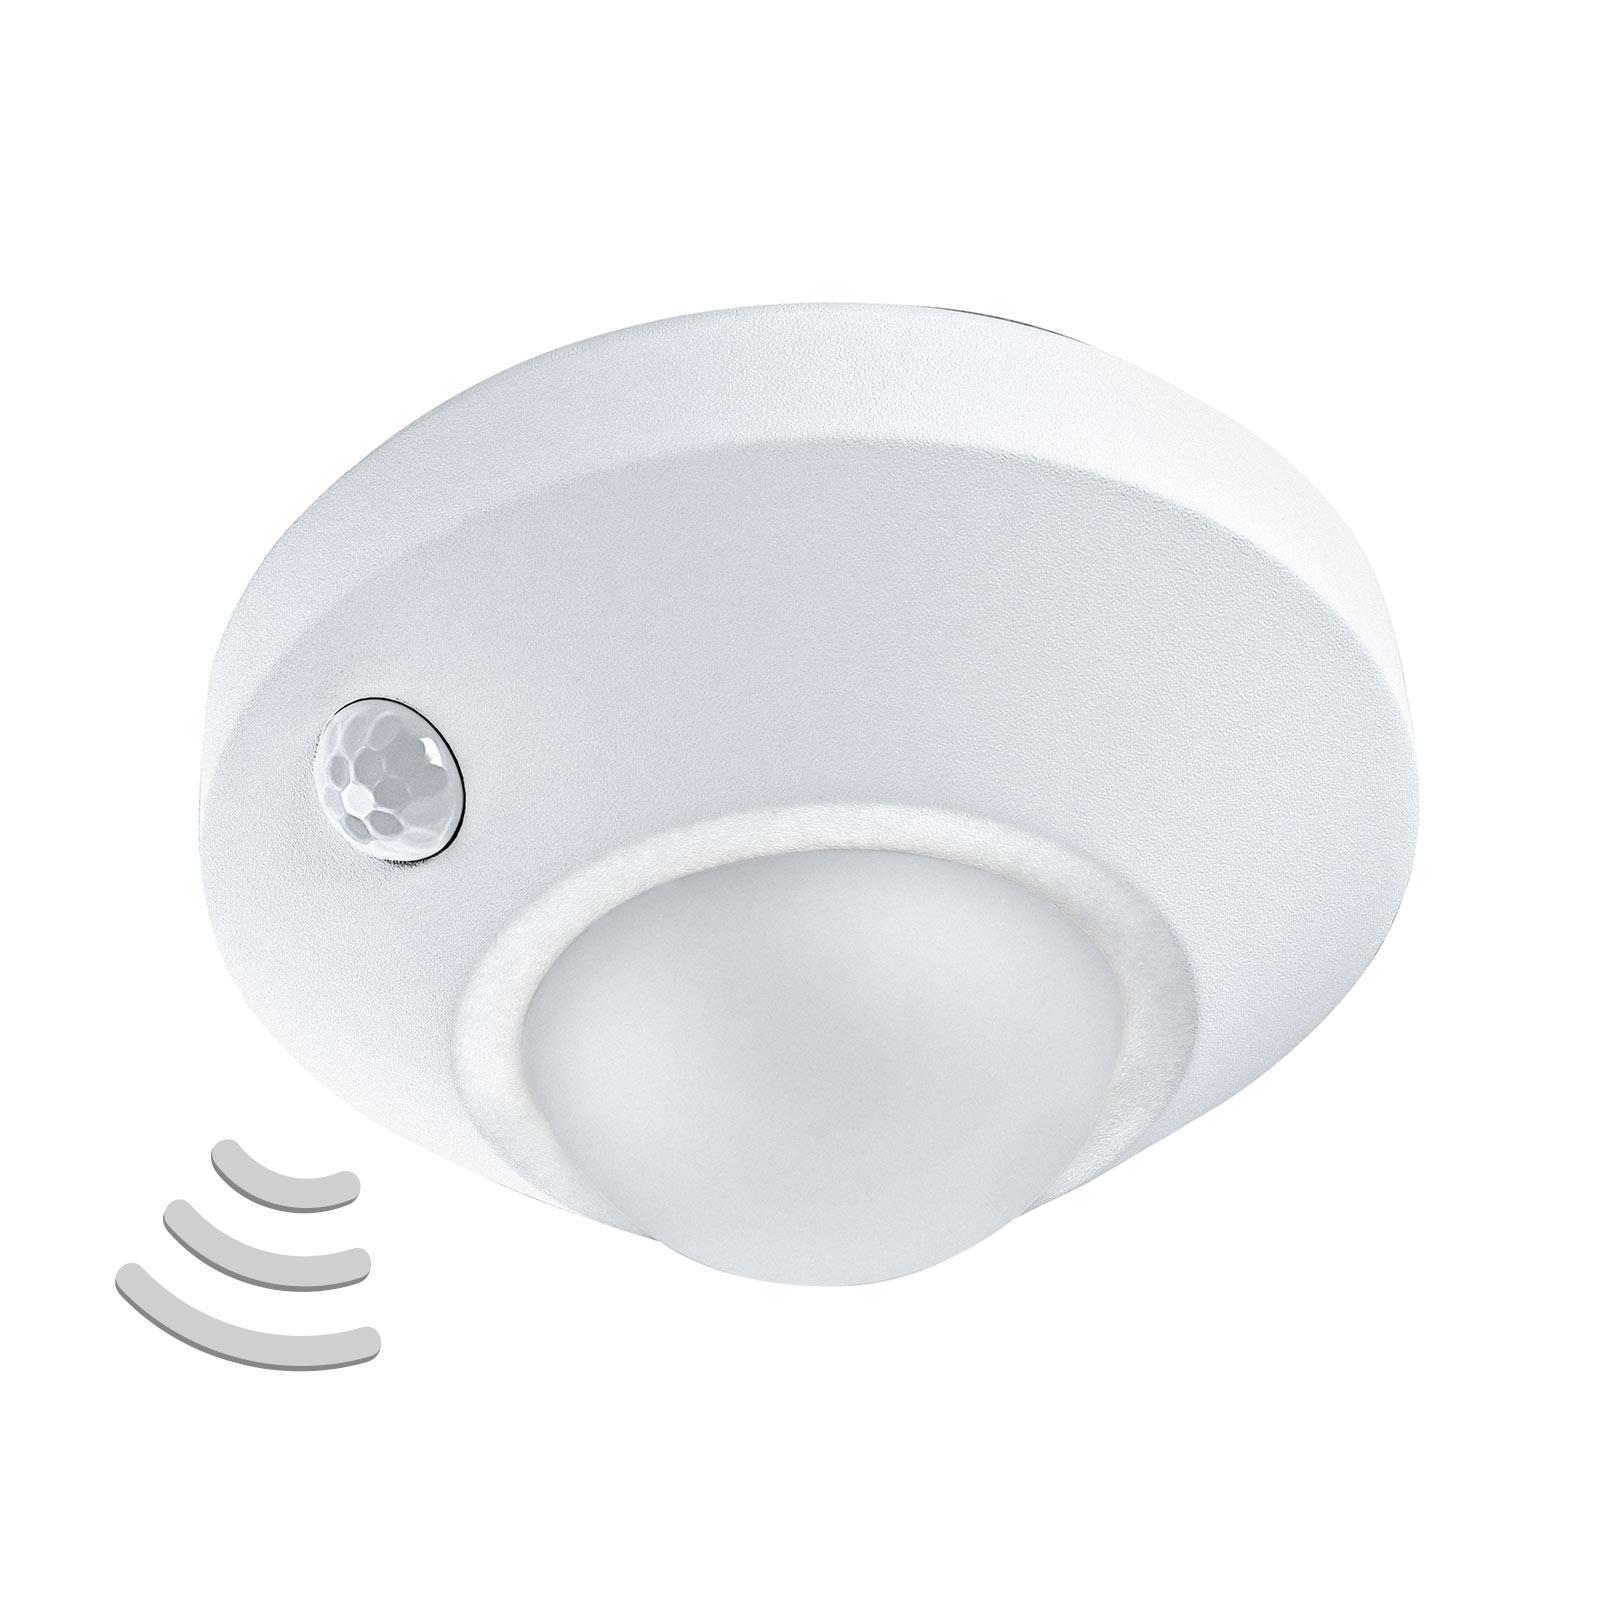 LEDVANCE Nightlux Ceiling LED-Nachtlicht weiß